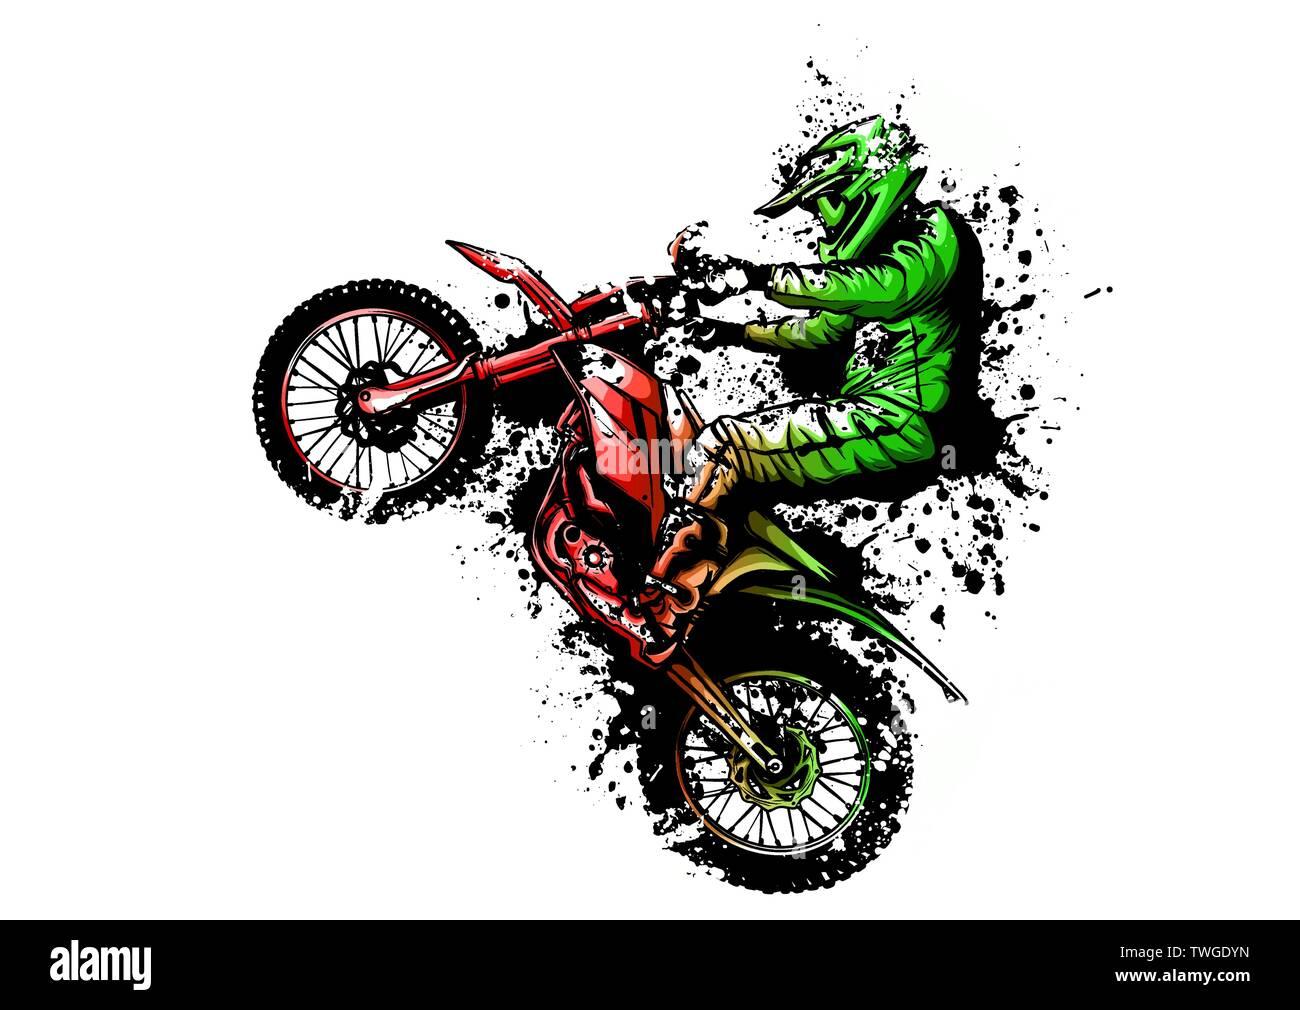 Motocross Rider Ride The Motocross Bike Vector Illustration Stock Vector Image Art Alamy